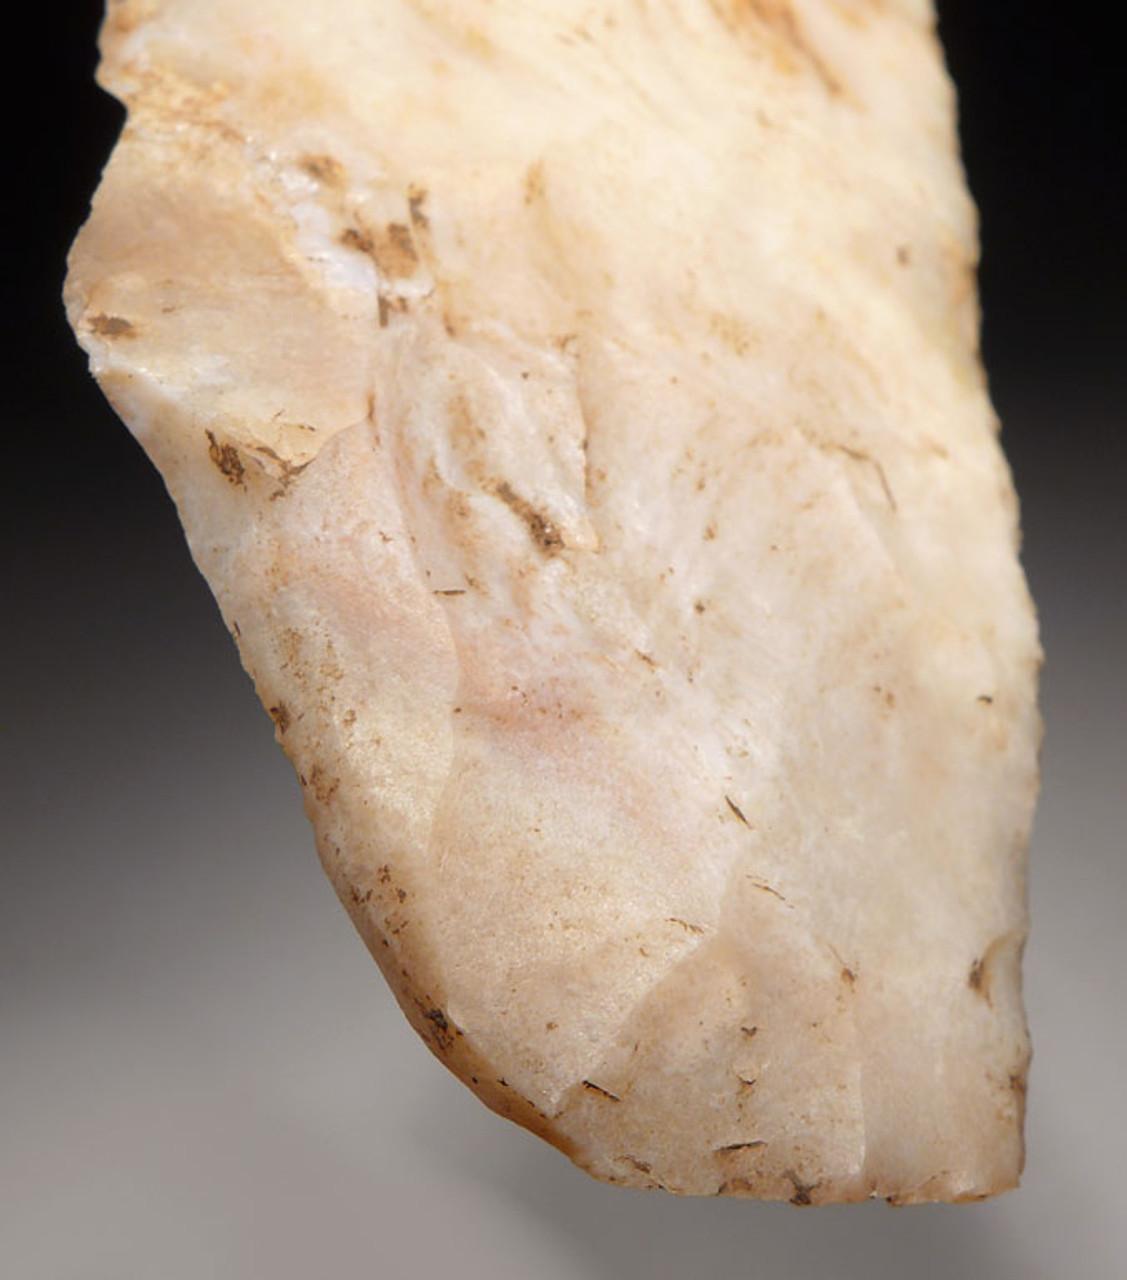 PC253 - MUSEUM-CLASS UNBROKEN AZTEC PRE-COLUMBIAN SACRIFICAL BIFACIAL DAGGER IN RARE WHITE FLINT